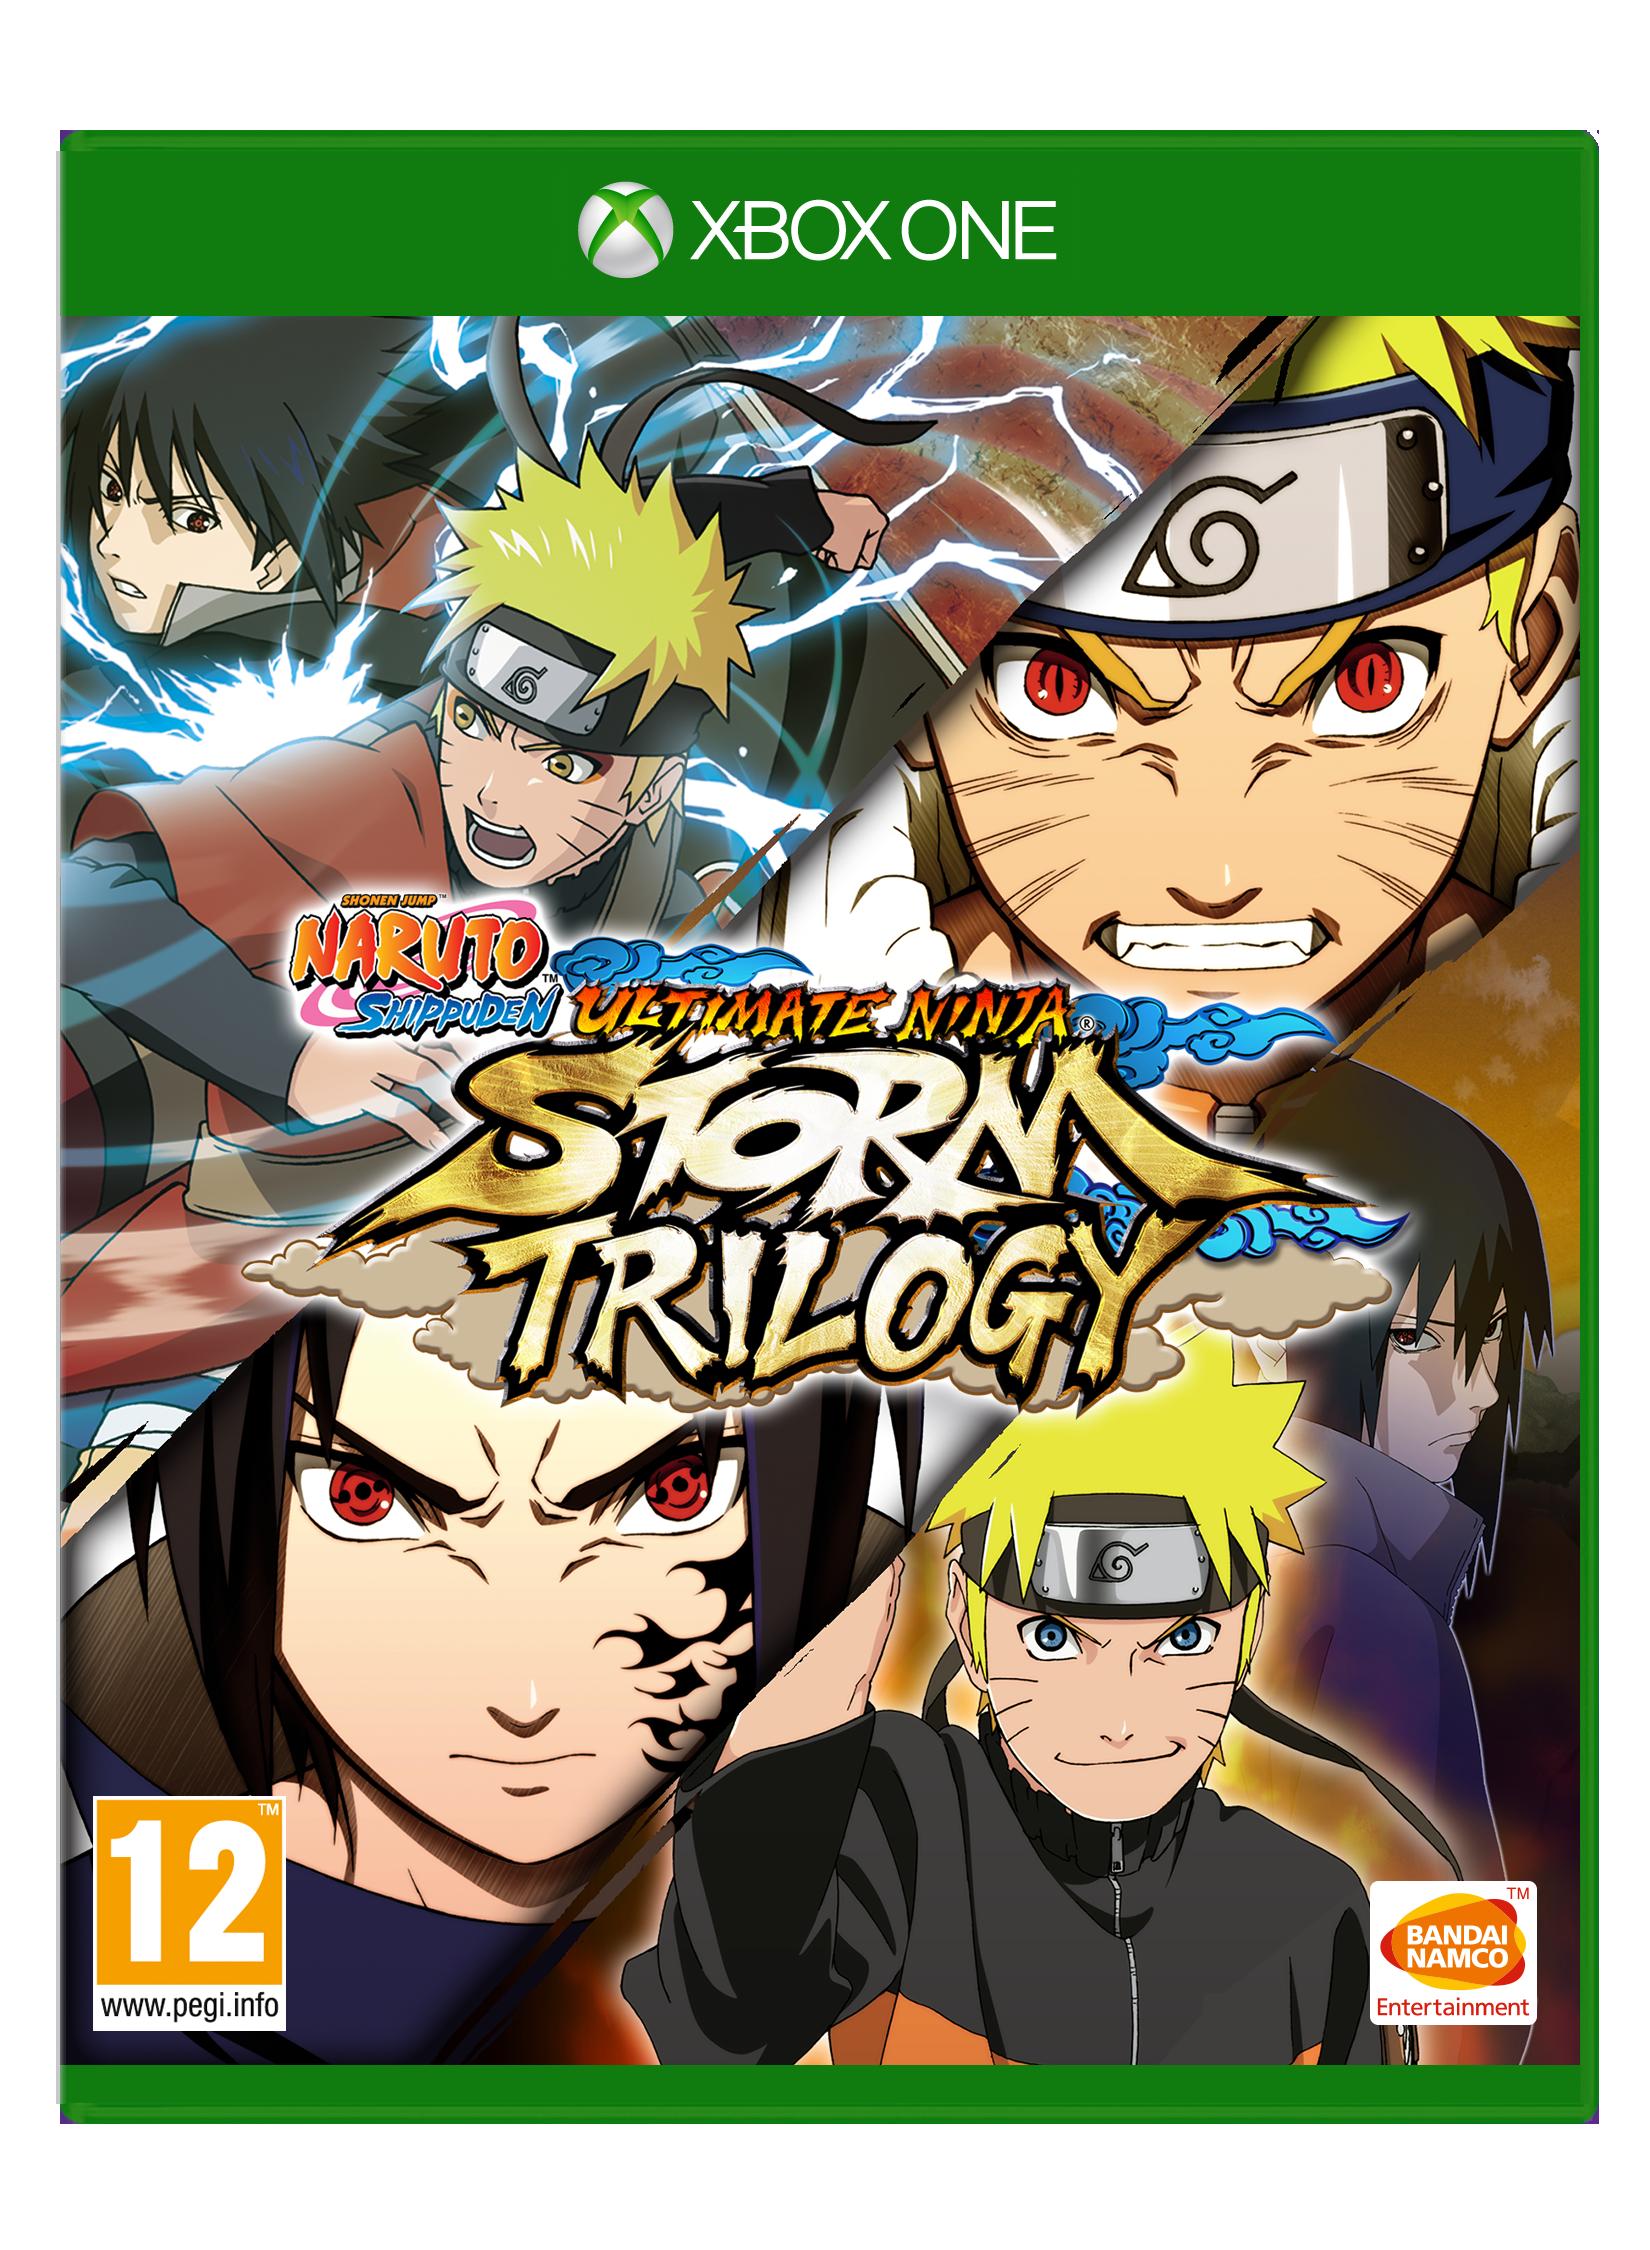 Naruto shippuden: ultimate ninja storm 2 special collectors.